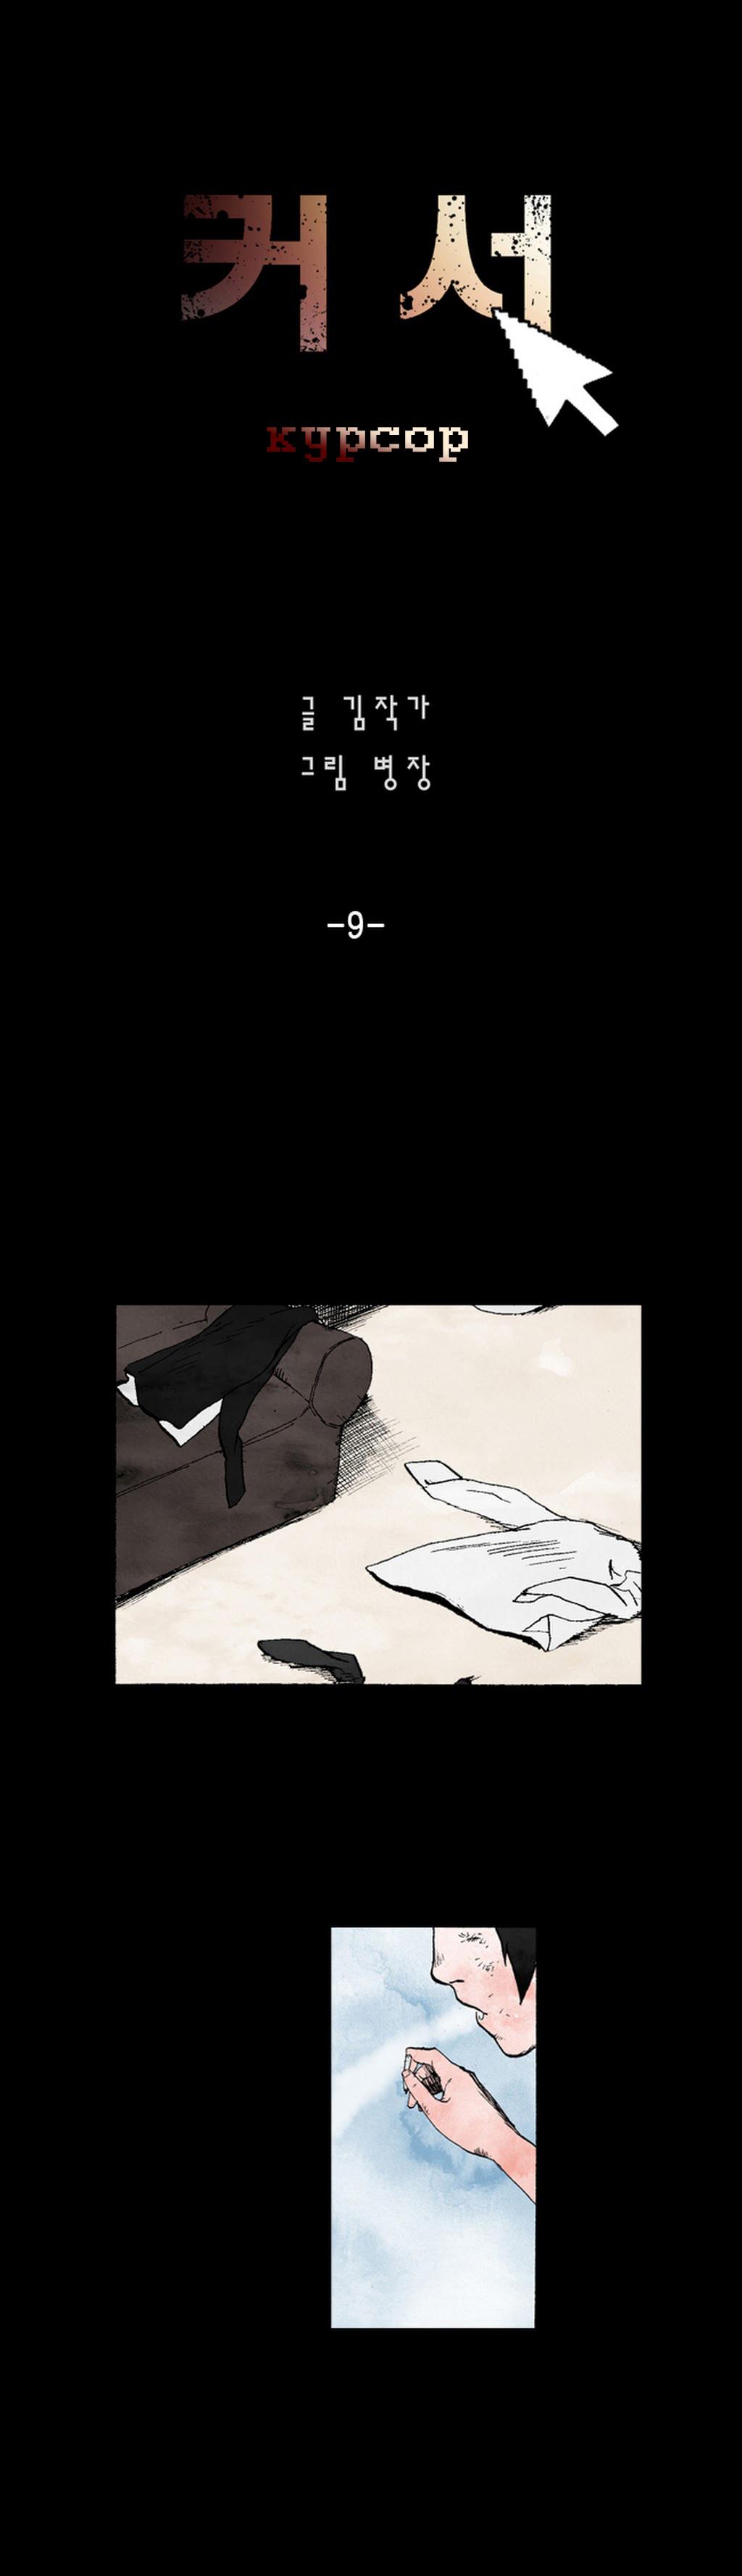 https://r1.ninemanga.com/comics/pic2/14/28302/307164/1470695160400.jpg Page 3